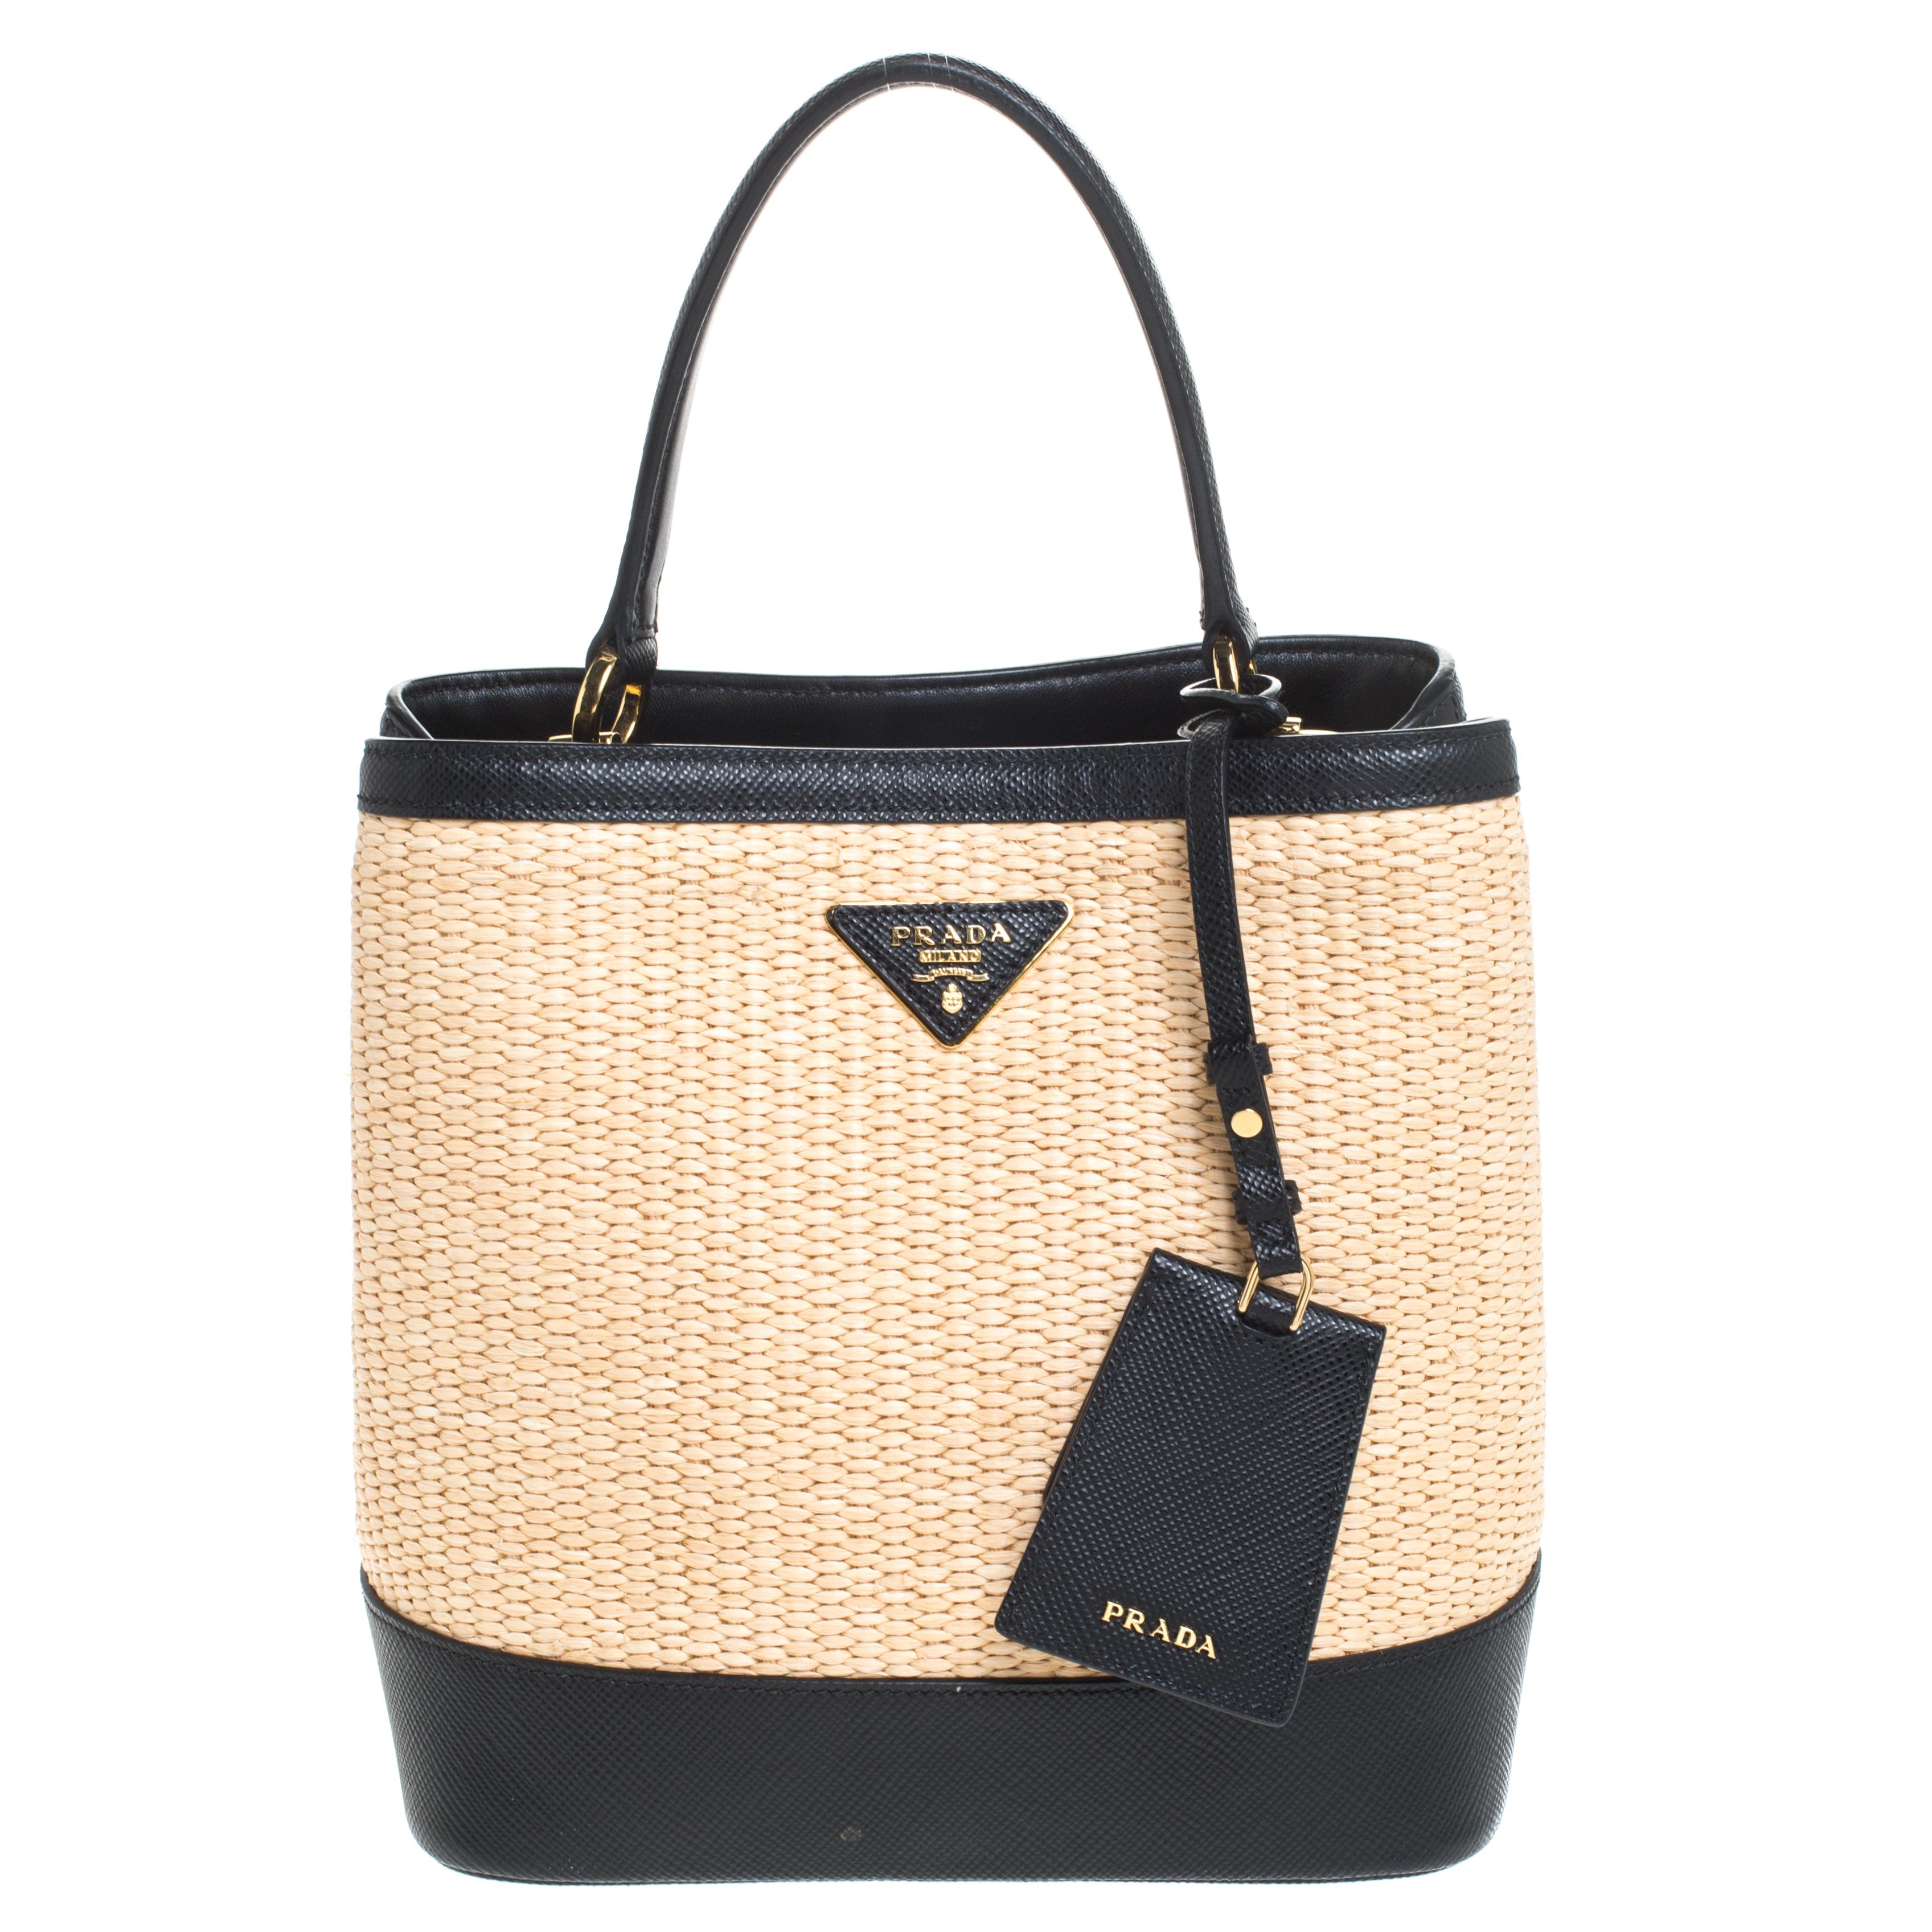 Prada Black/Beige Straw and Leather Medium Panier Top Handle Bag